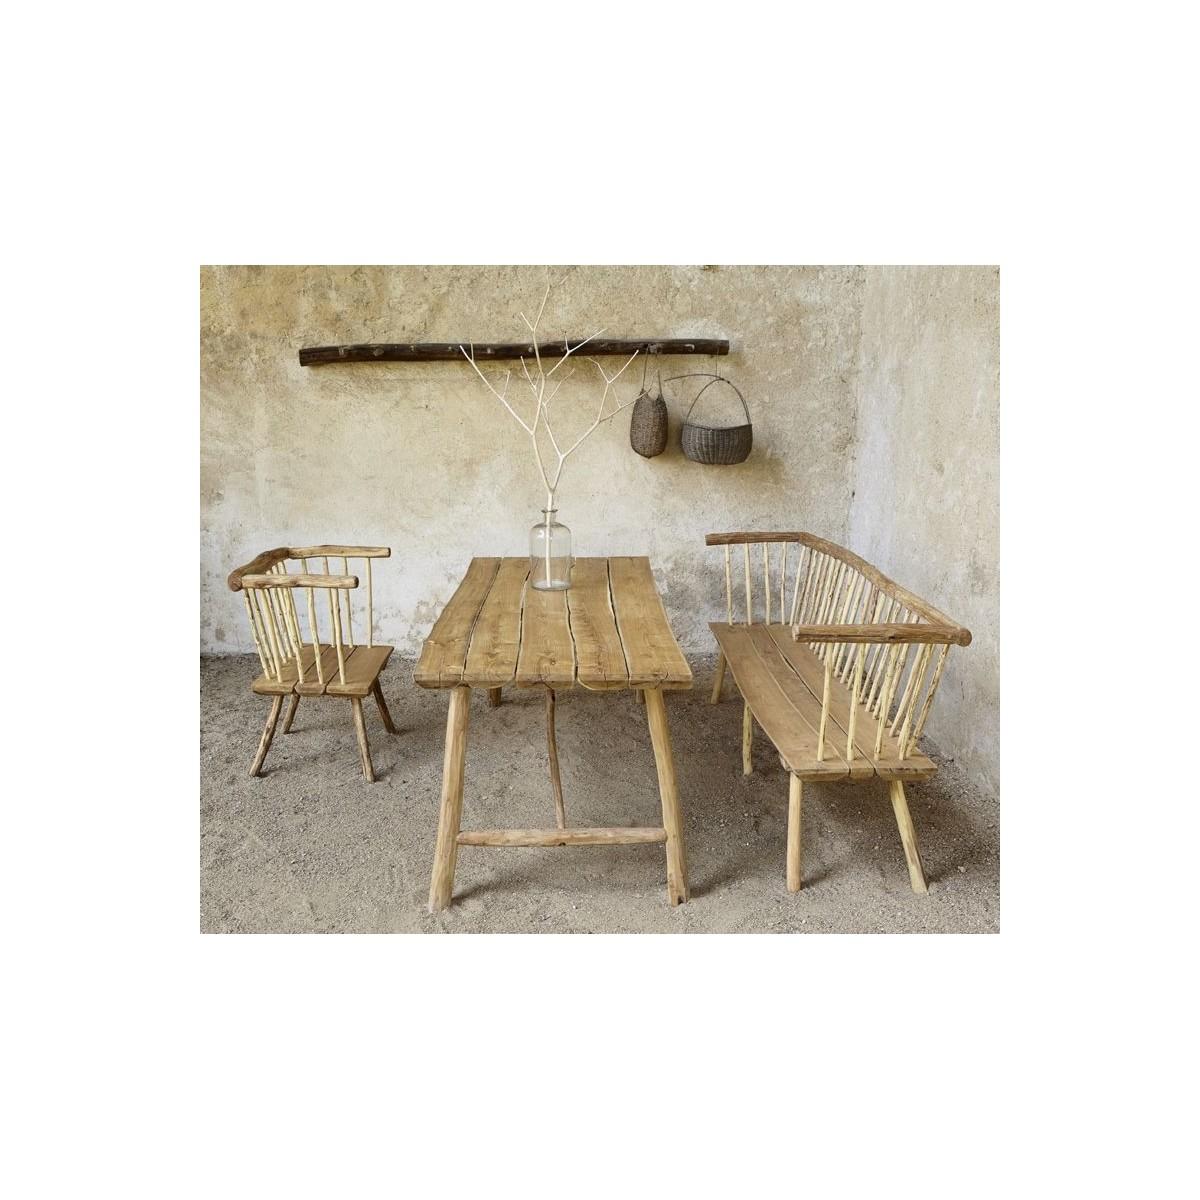 banc de jardin le bon coin id es d coration id es d coration. Black Bedroom Furniture Sets. Home Design Ideas